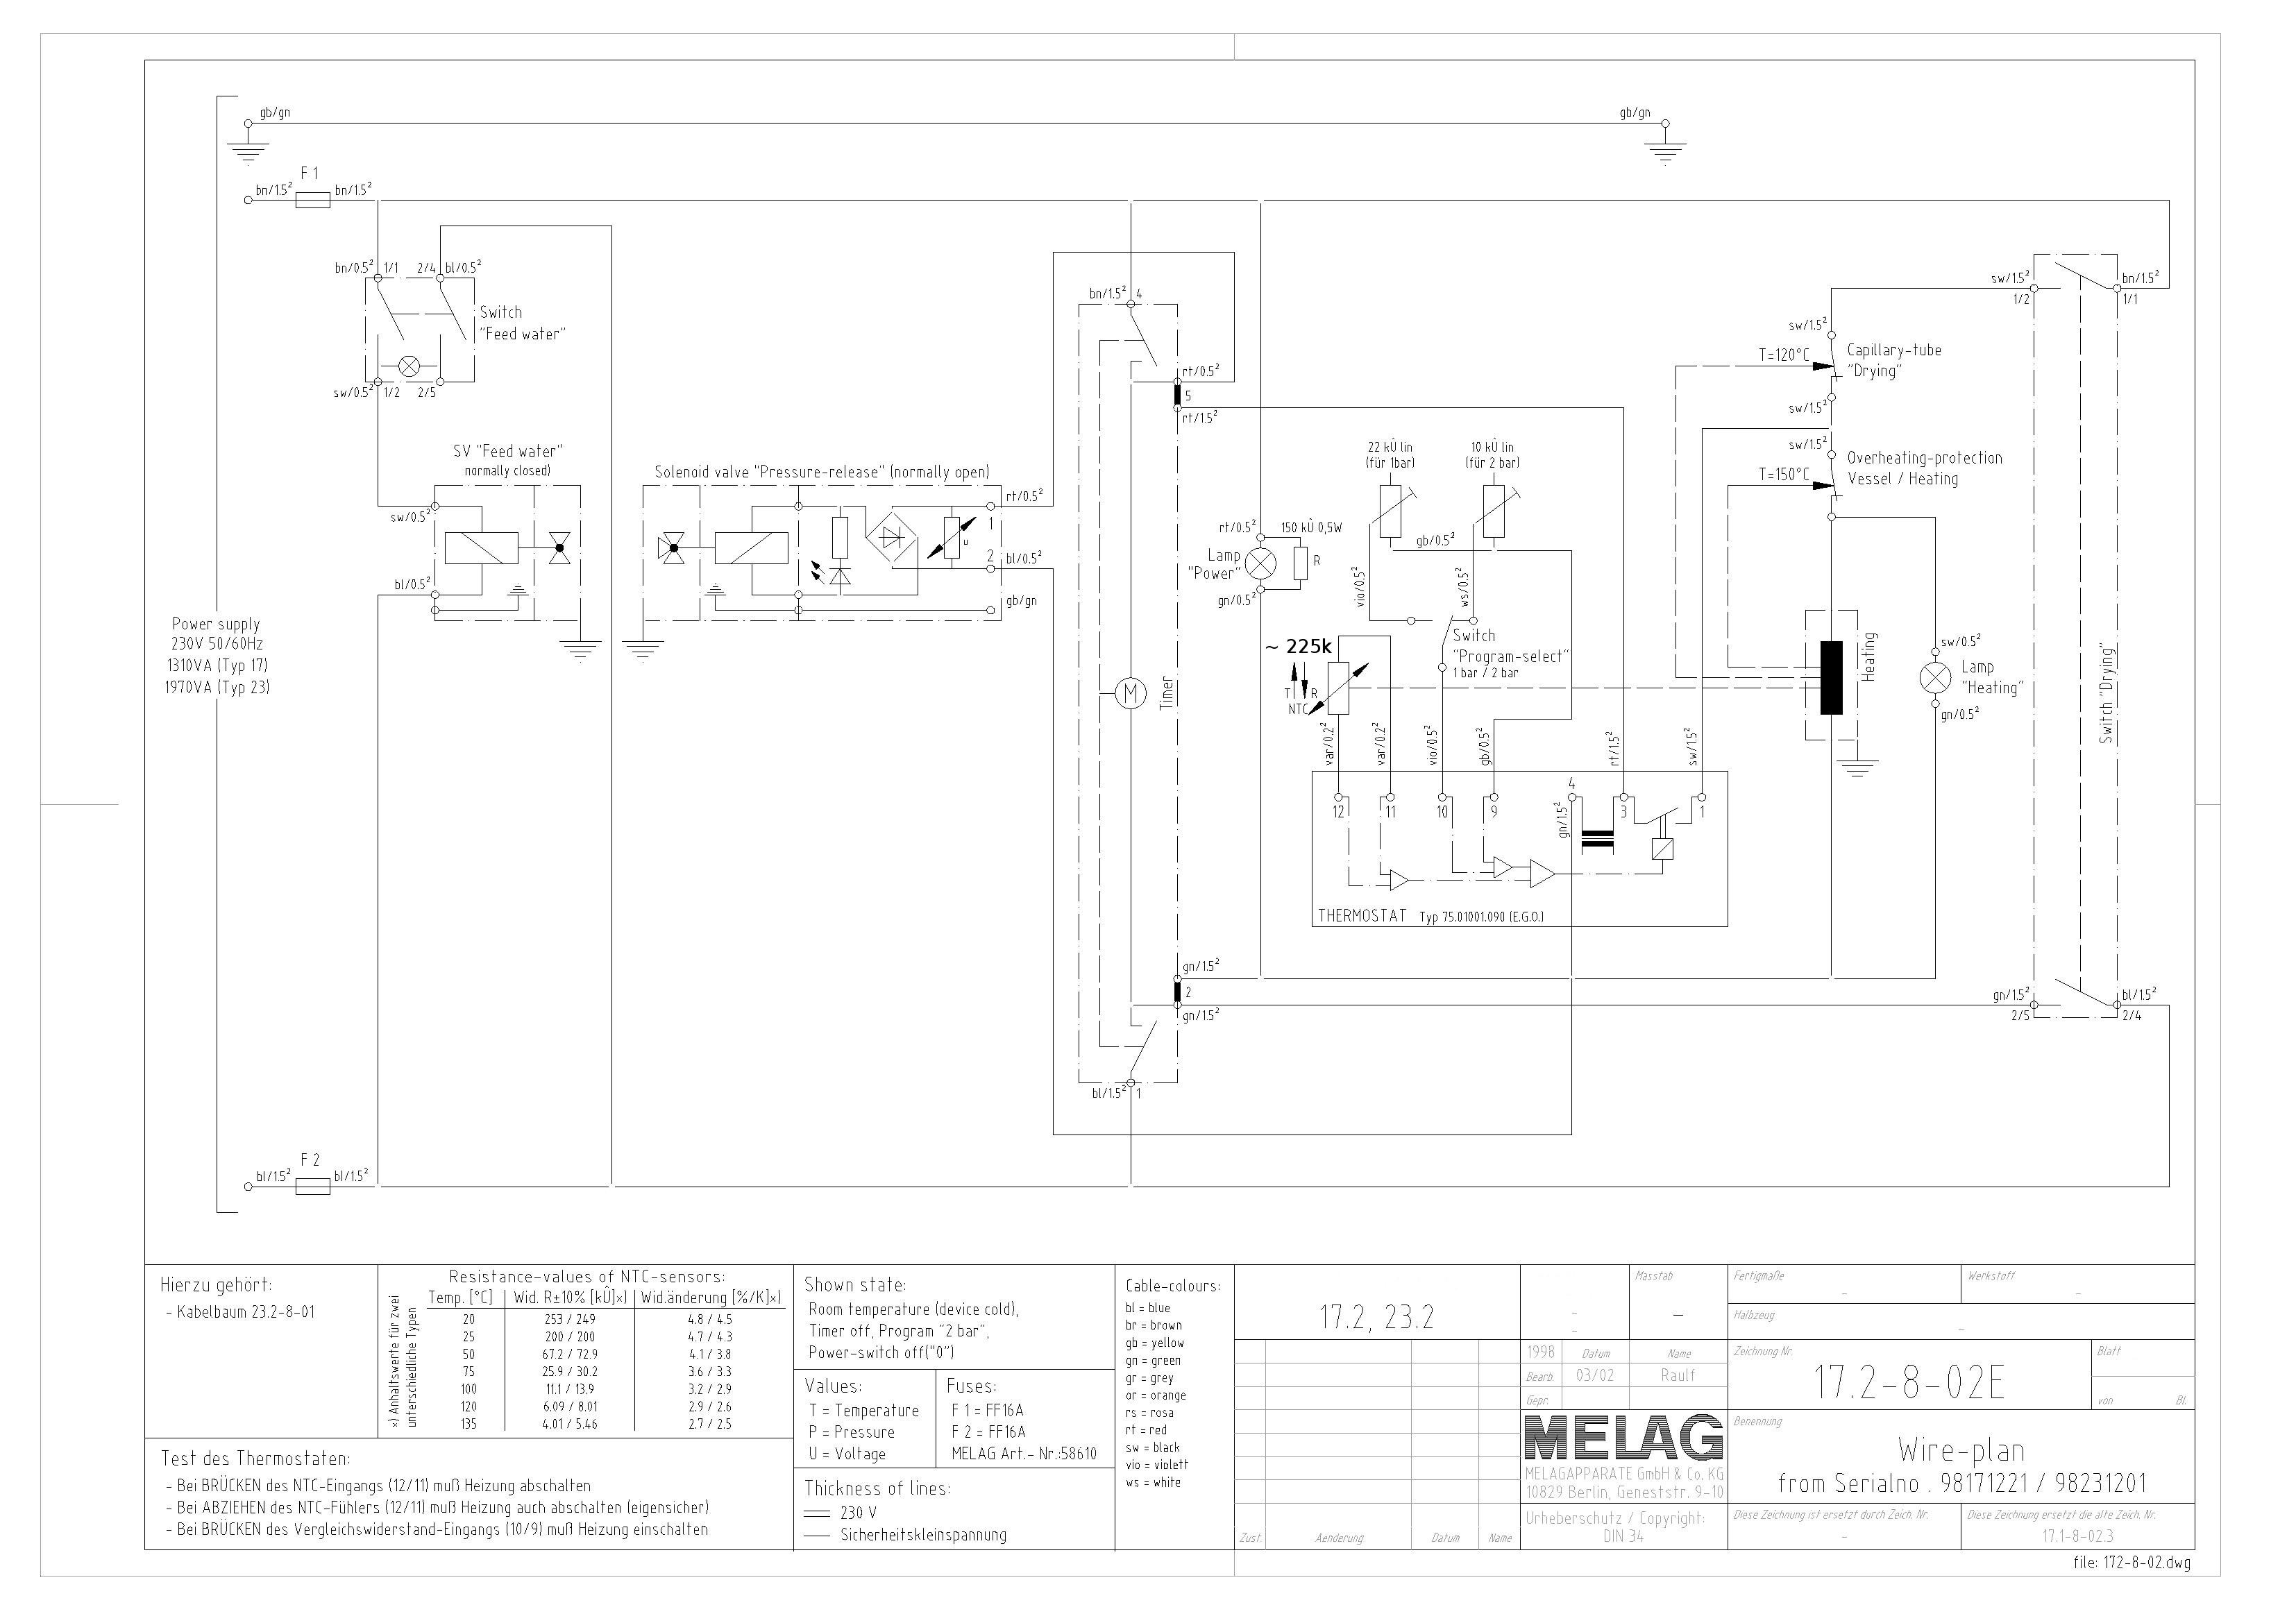 Franks Autoclaves Wiring Diagram For Workshop Free Download Schematic Melag 23 Service Manual 90 Kb